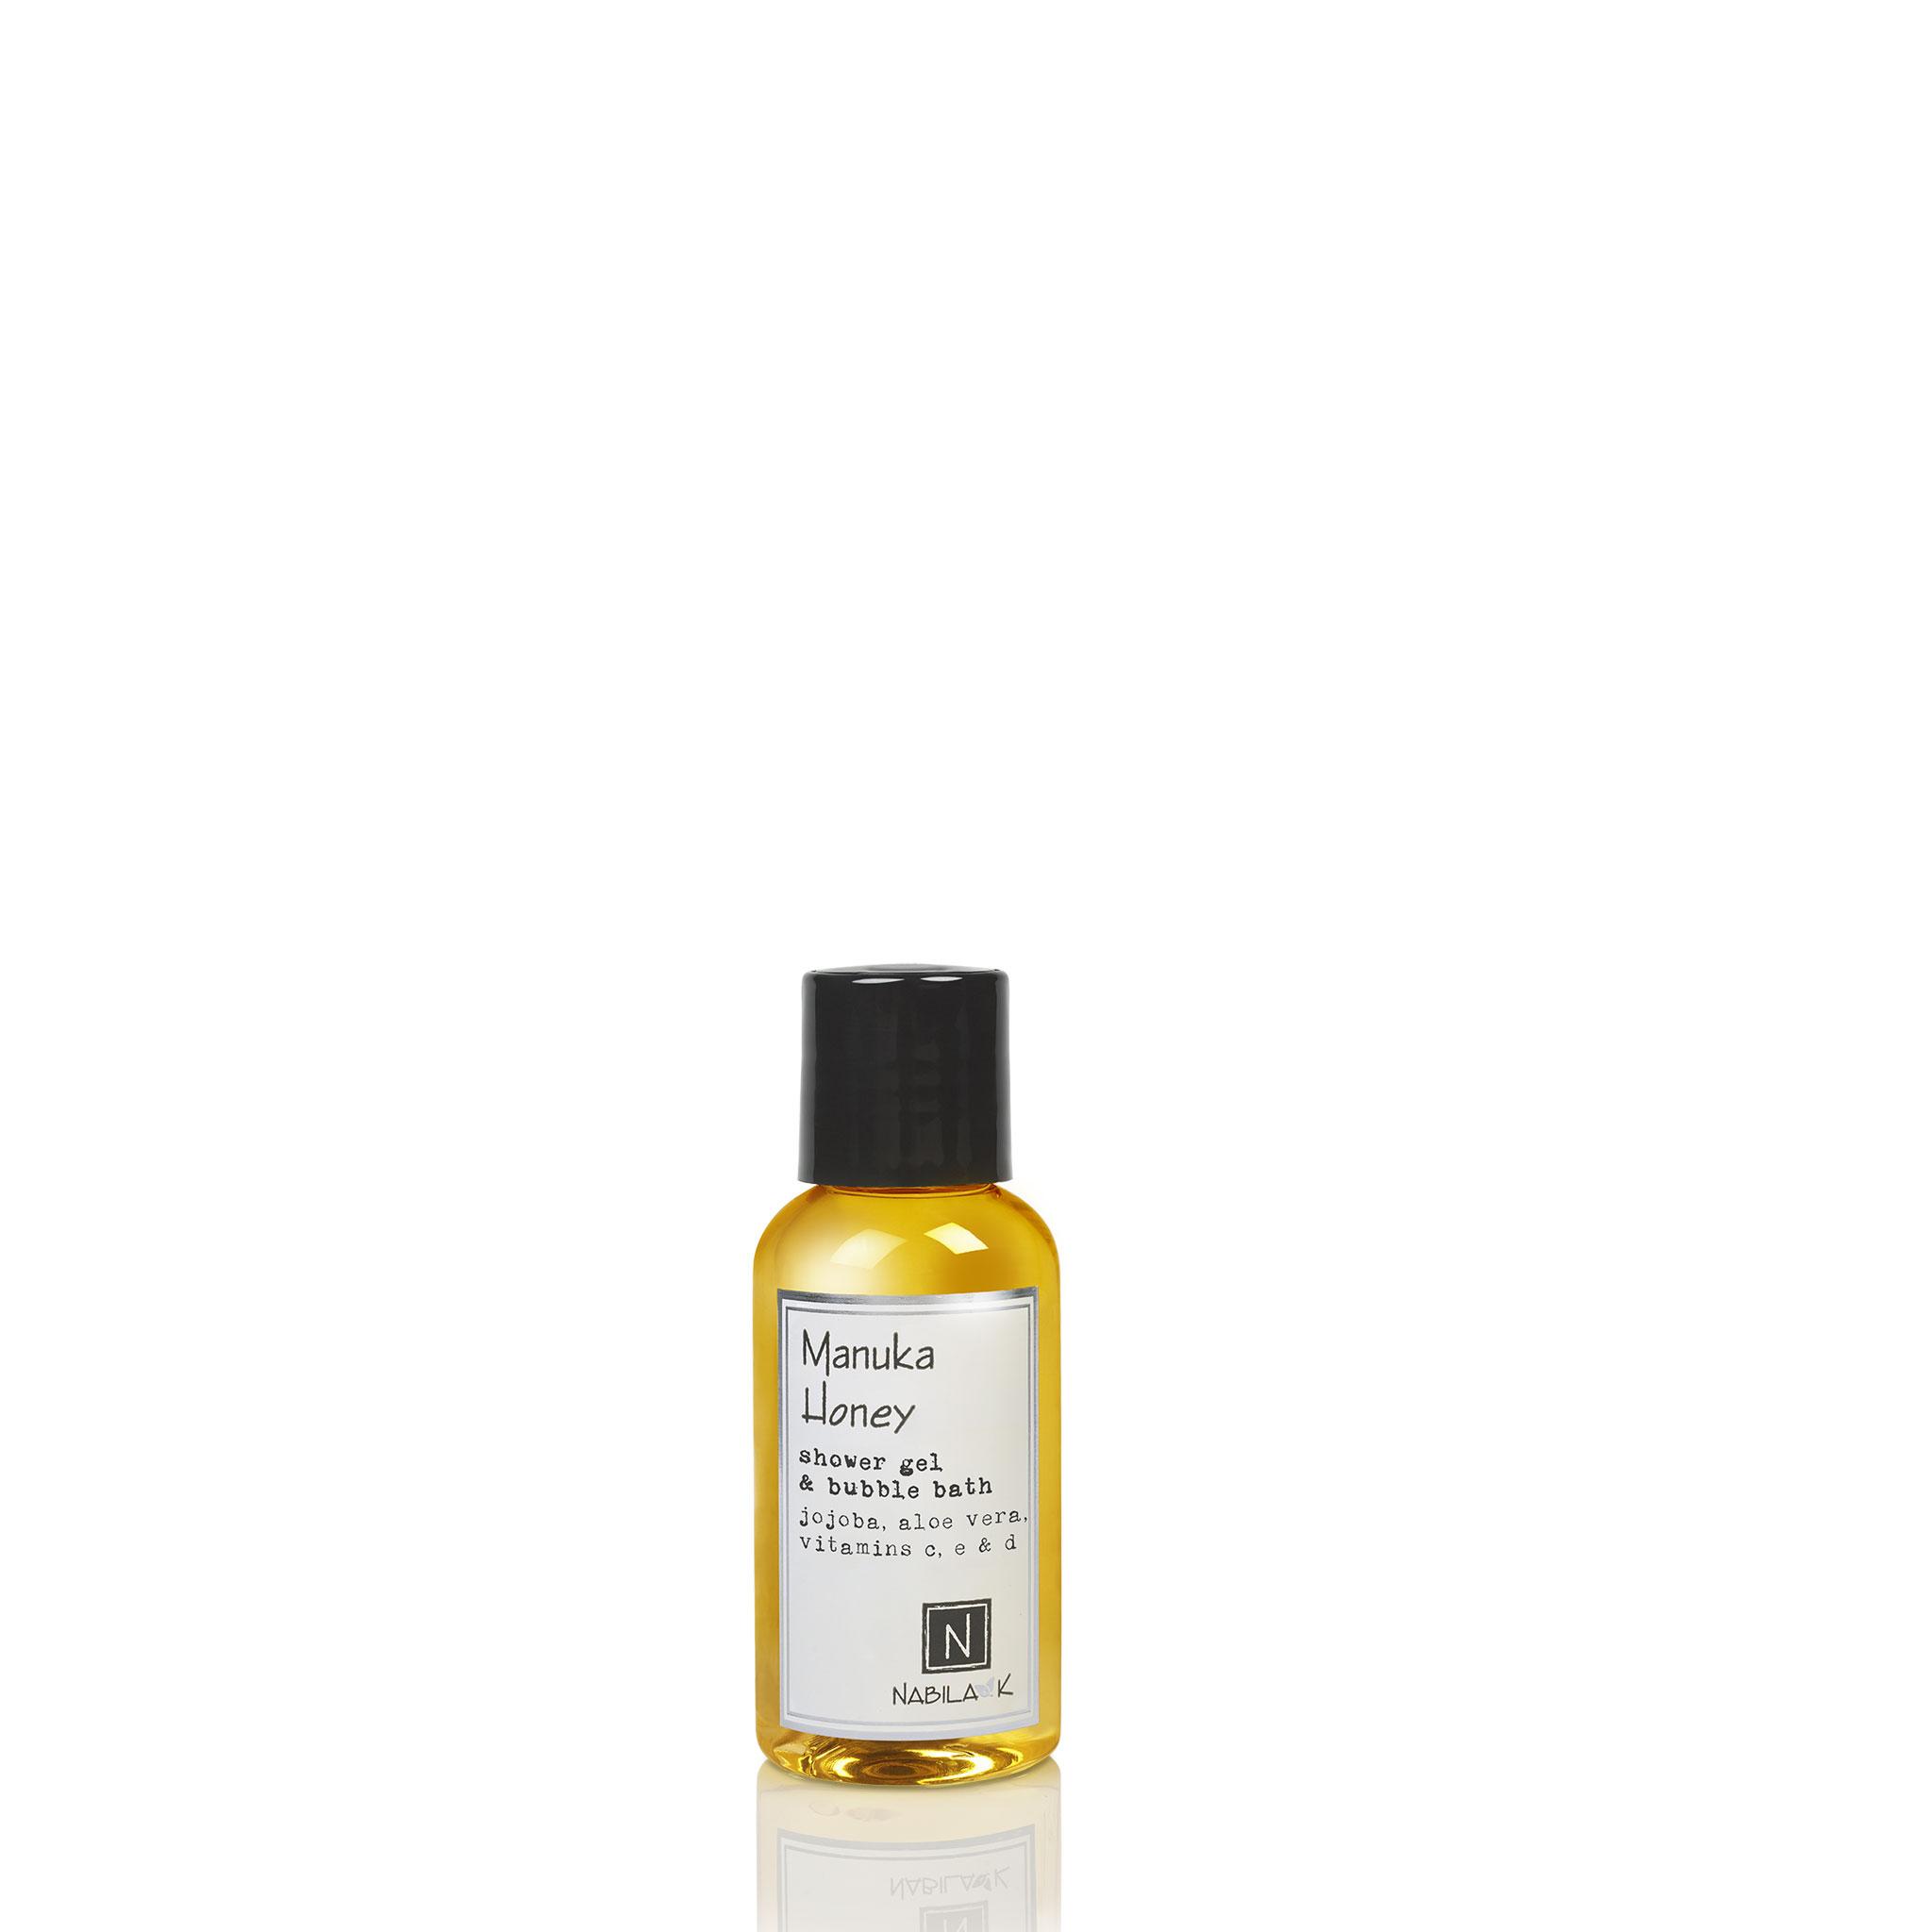 One Travel Size Version of Nabila K's Manuka Honey Shower Gel and Bubble Bath Jojoba, Aloe Vera, Vitamins C, E, & D